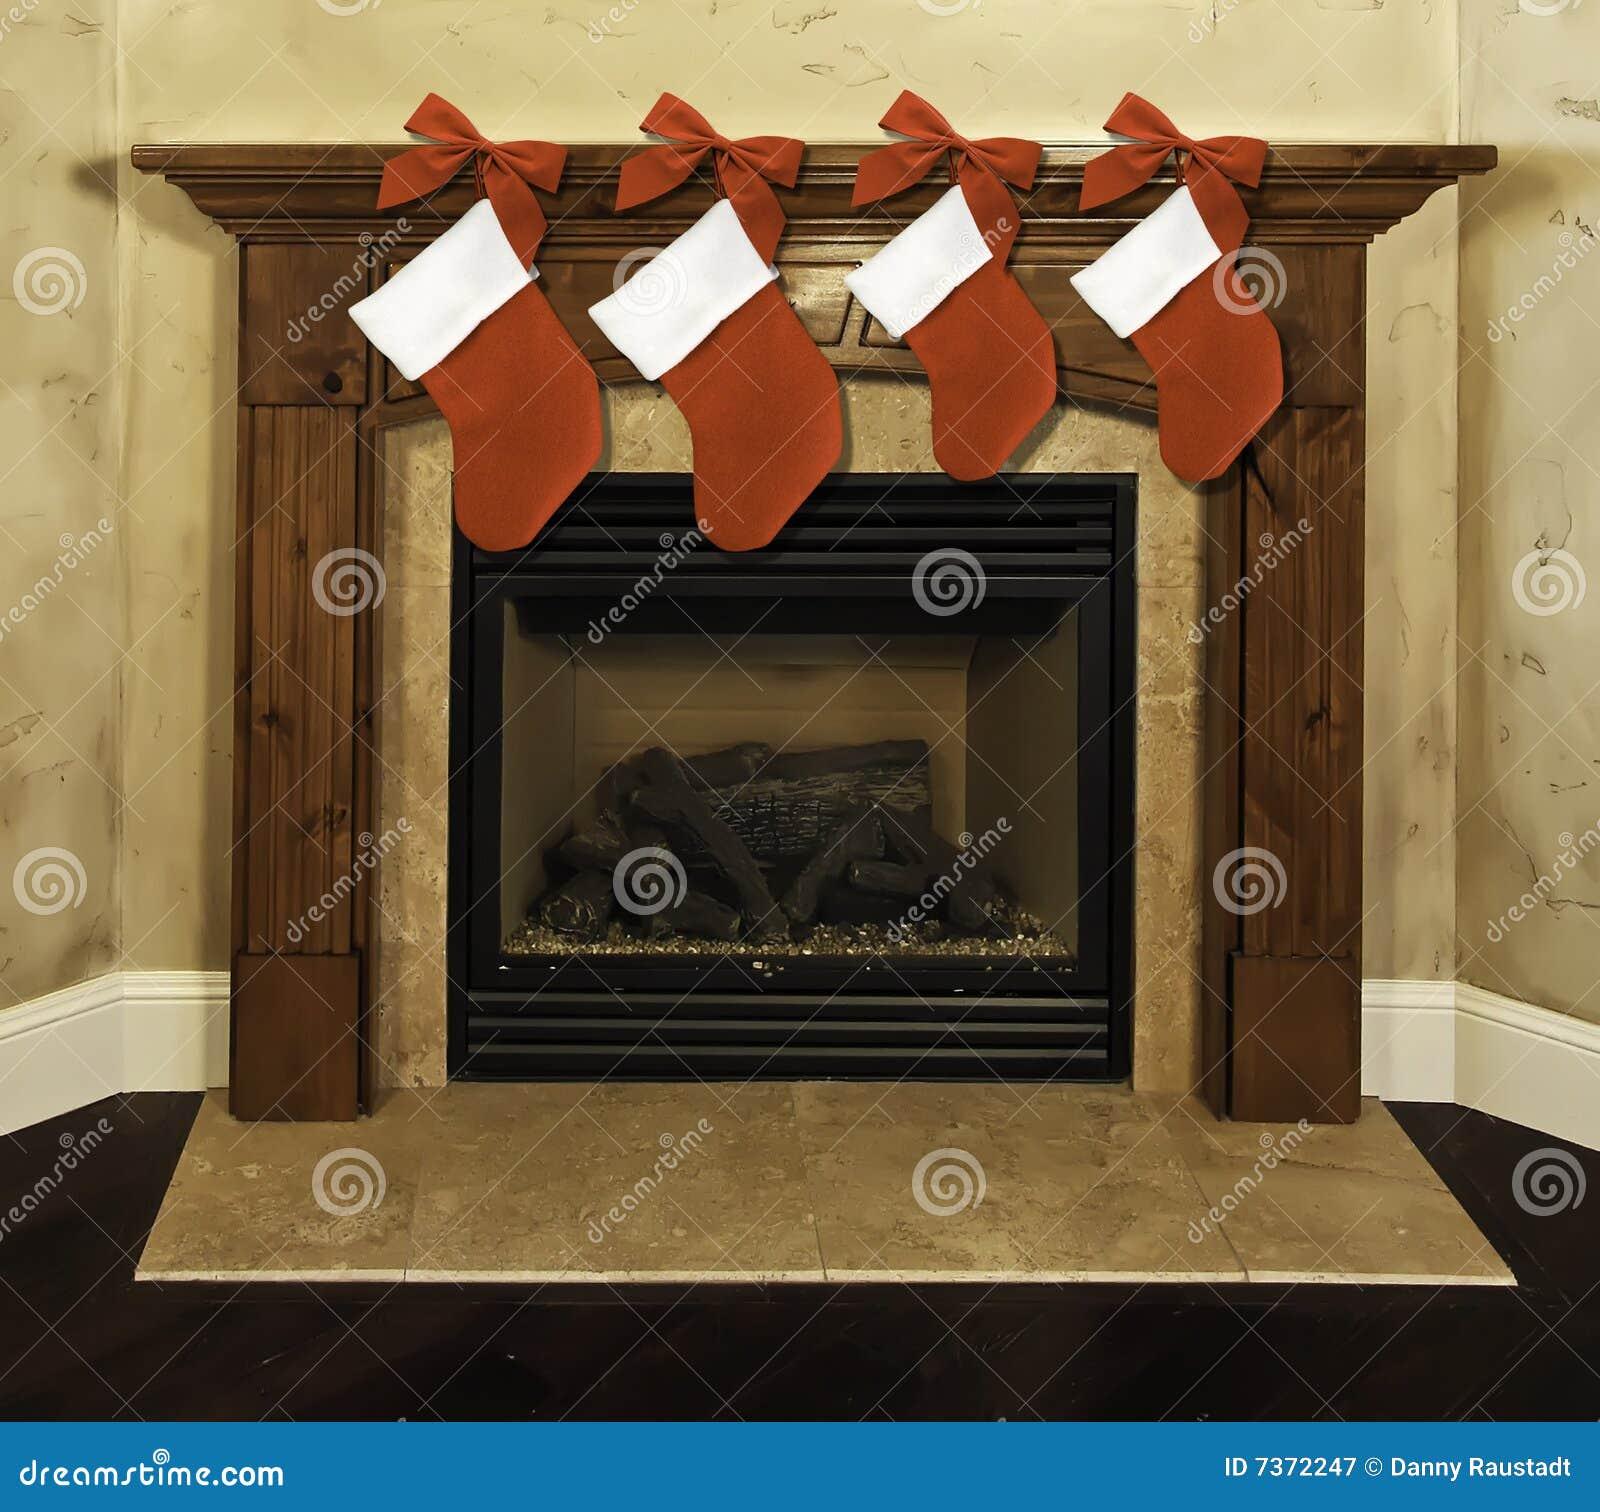 Fireplace Mantel Christmas Stockings Stock Image Image